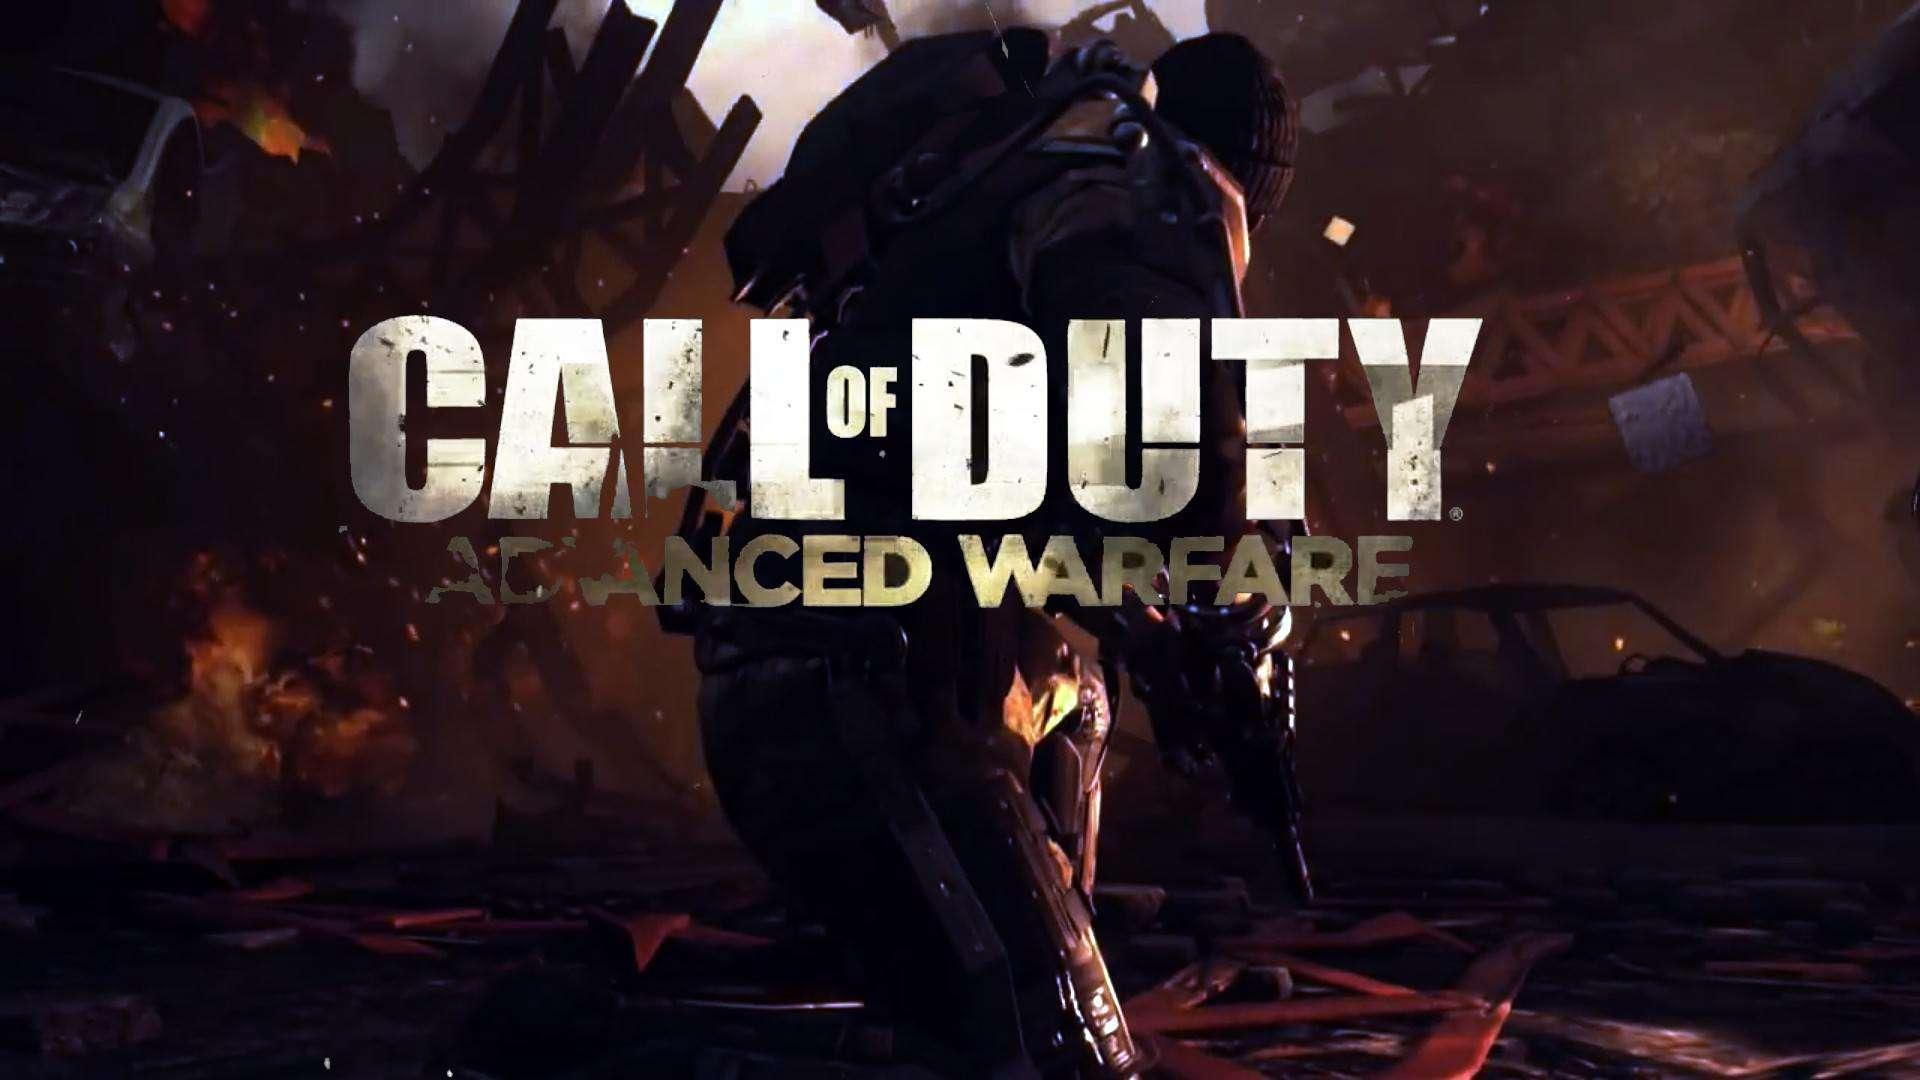 Download Call of Duty Advanced Warfare 04 HD Wallpaper HDWallWide 1920x1080